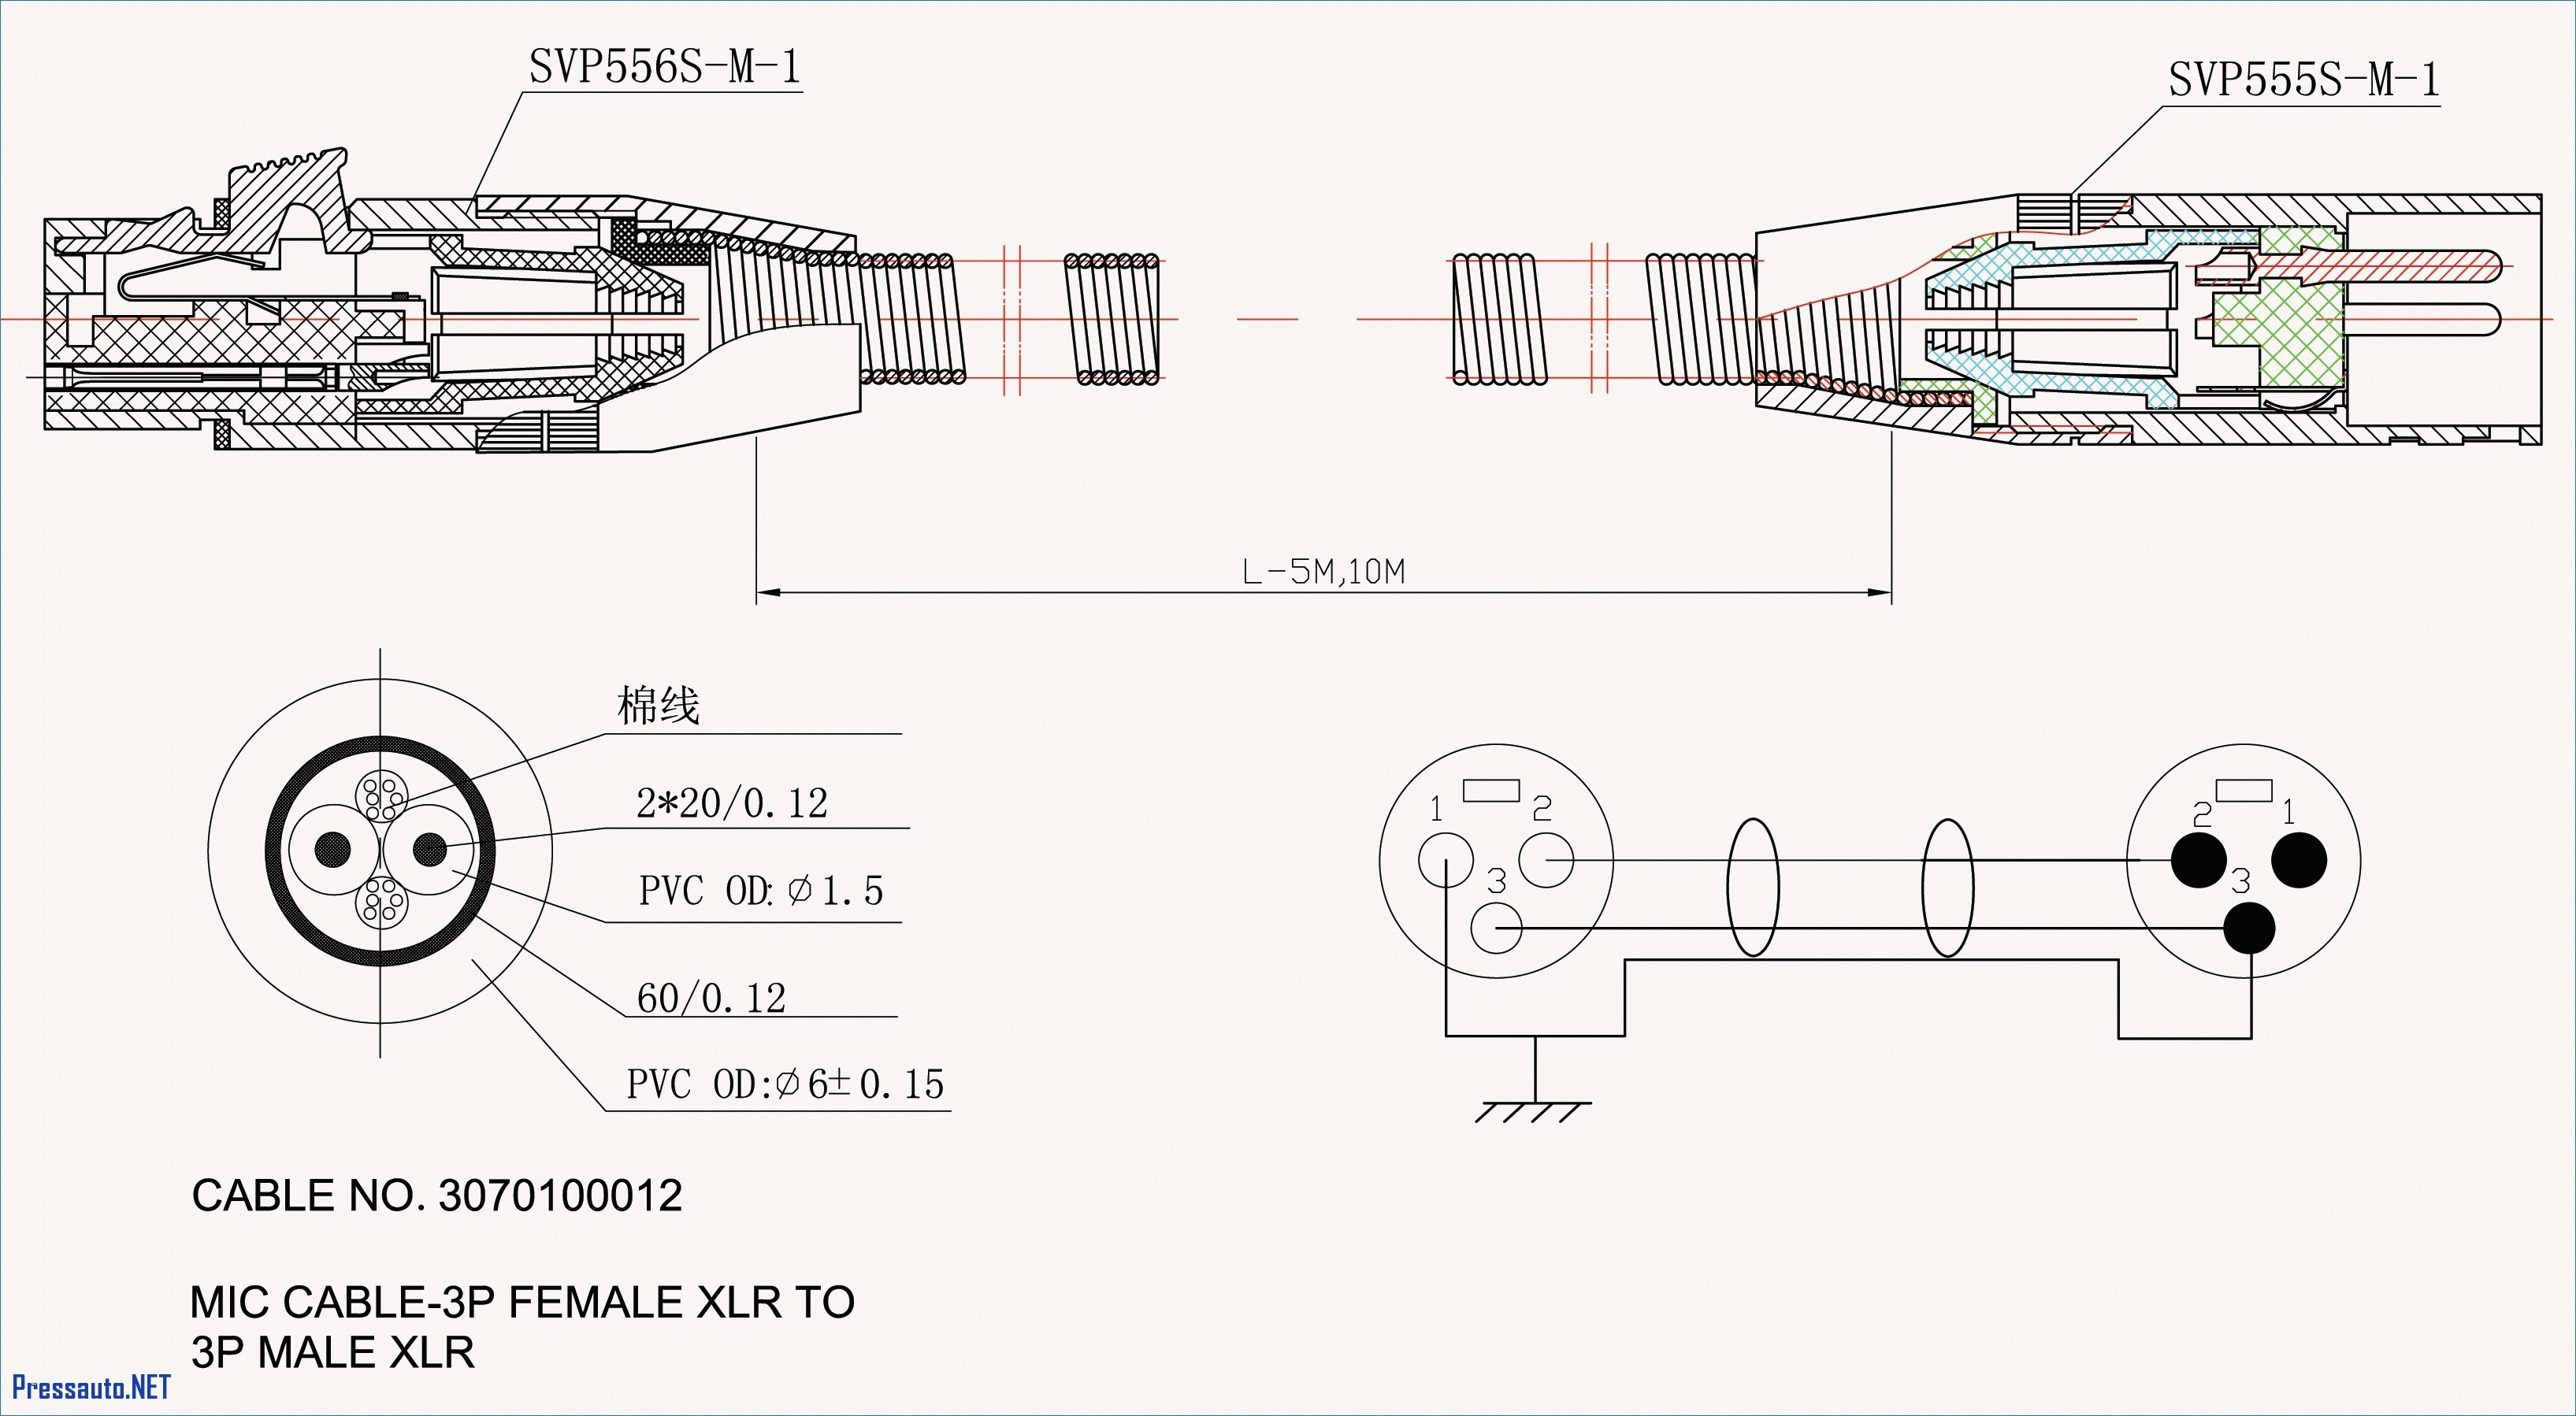 Ford 4 2 Engine Diagram ford Ranger 2 3 Engine Wiring Experts Wiring Diagram • Of Ford 4 2 Engine Diagram